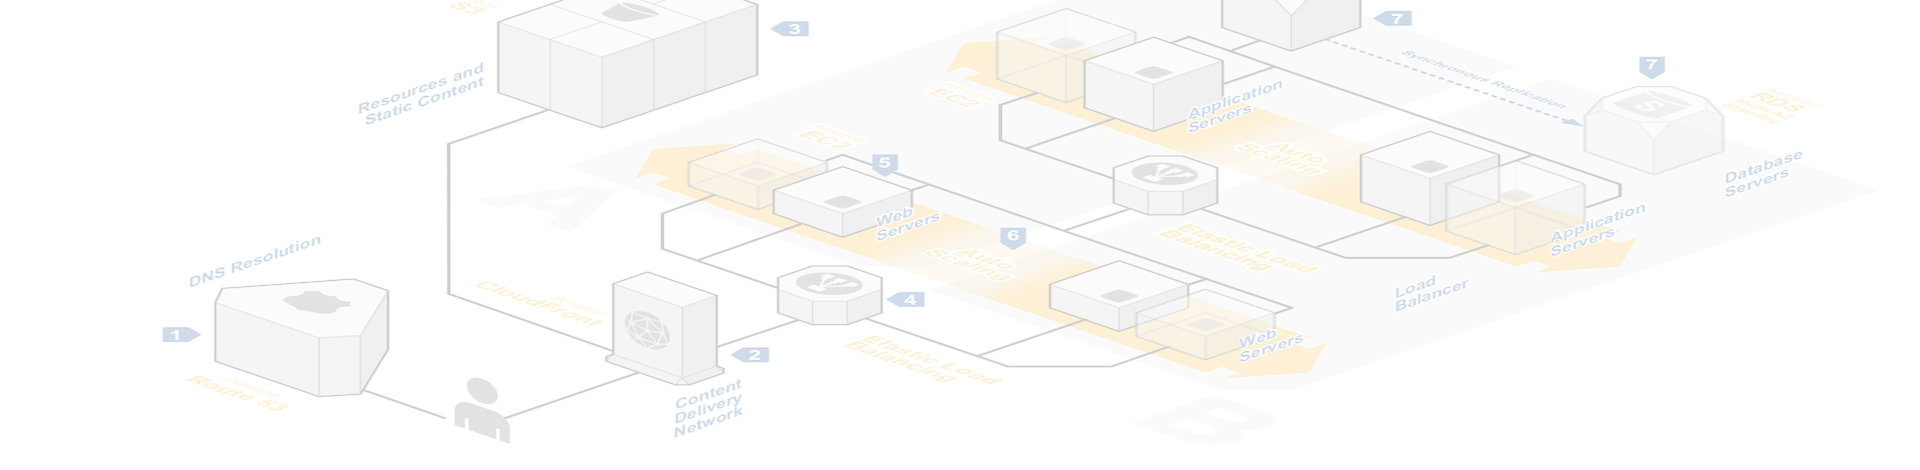 Arquitectura AWS